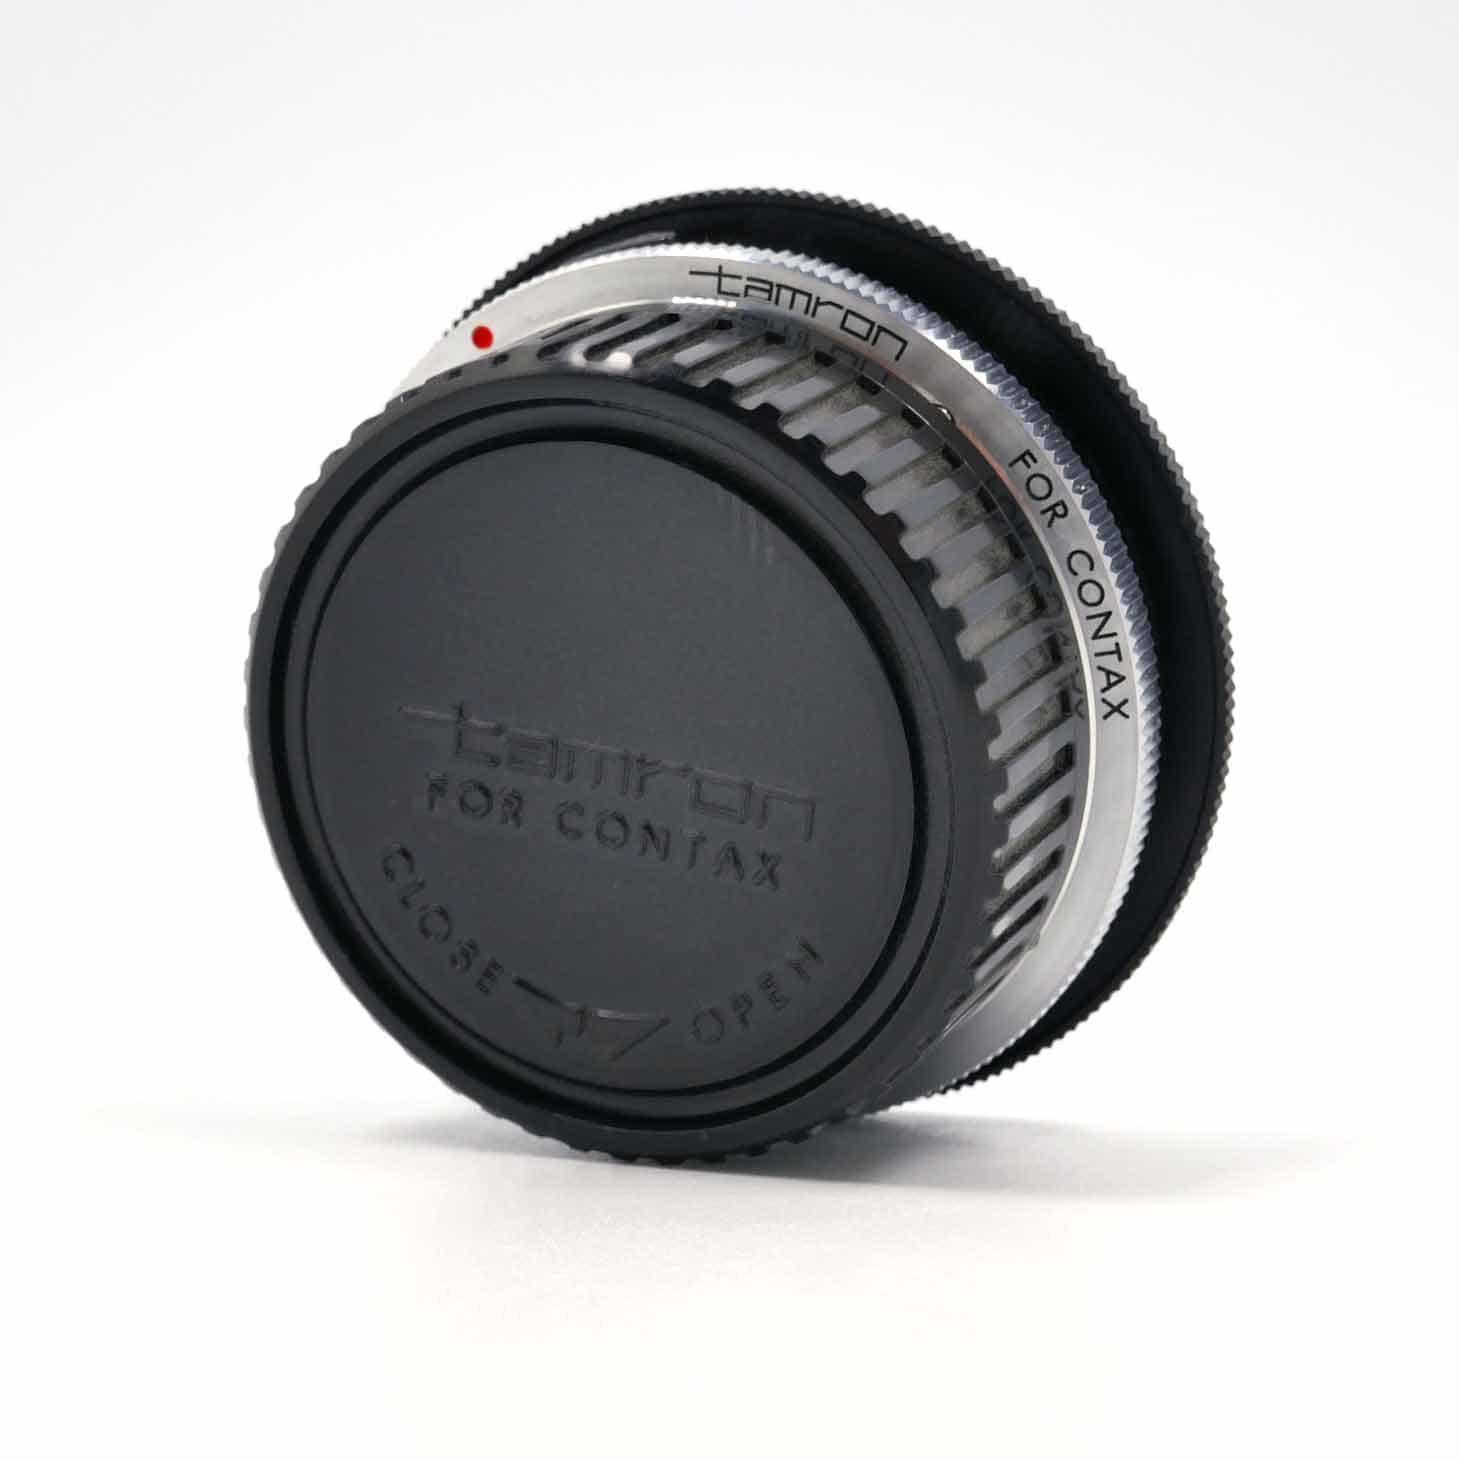 clean-cameras-Tamron-Adaptall-Contax-04